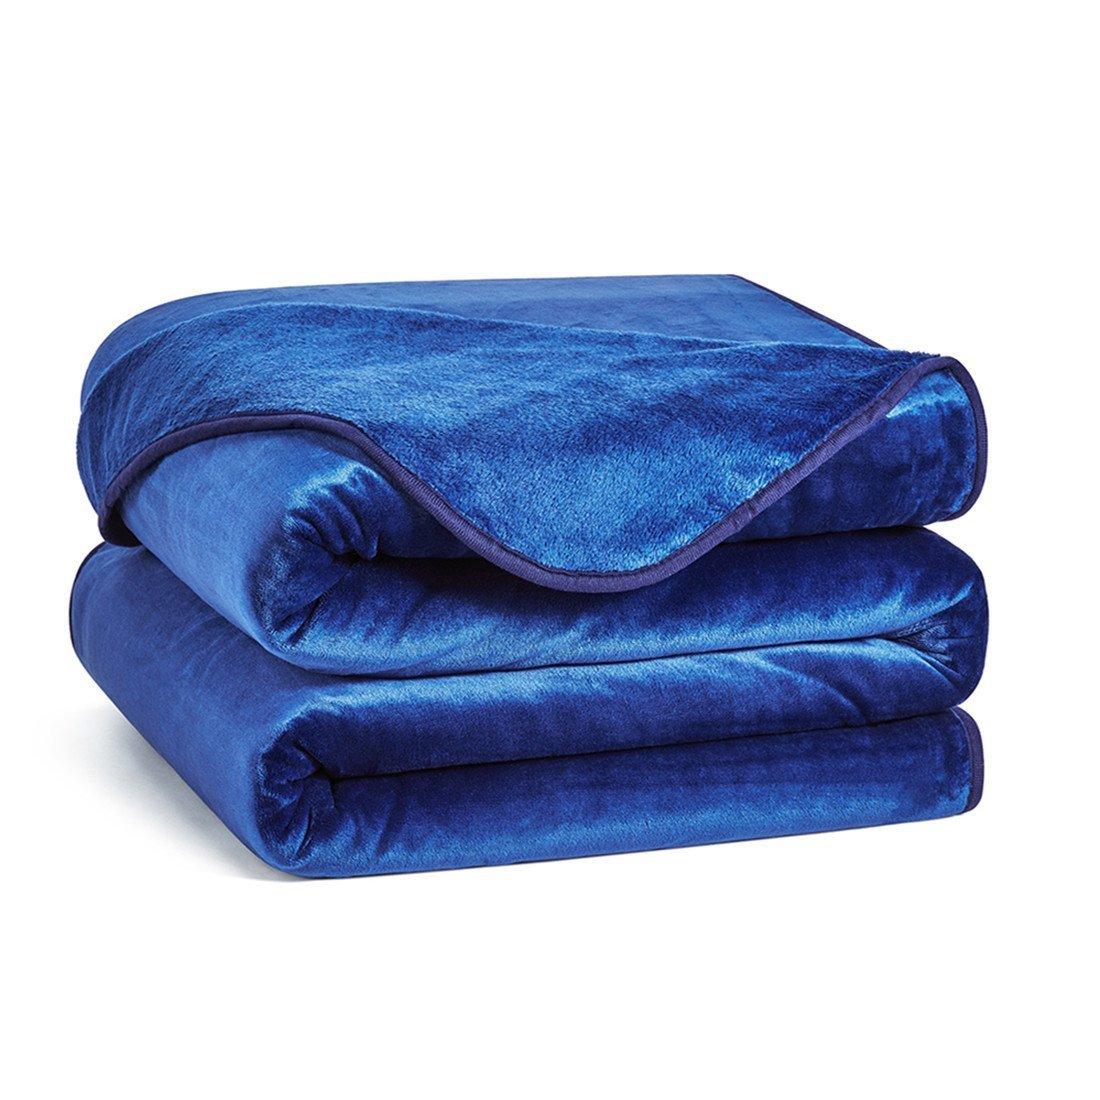 Charm Heart Luxury Fleece Blanket,King Size Lightweight Silky Super Soft Summer Cooling Cozy Flannel Warm Plush All-Season Anti-static Bed Couch Sofa Blanket(King,Dark Blue)